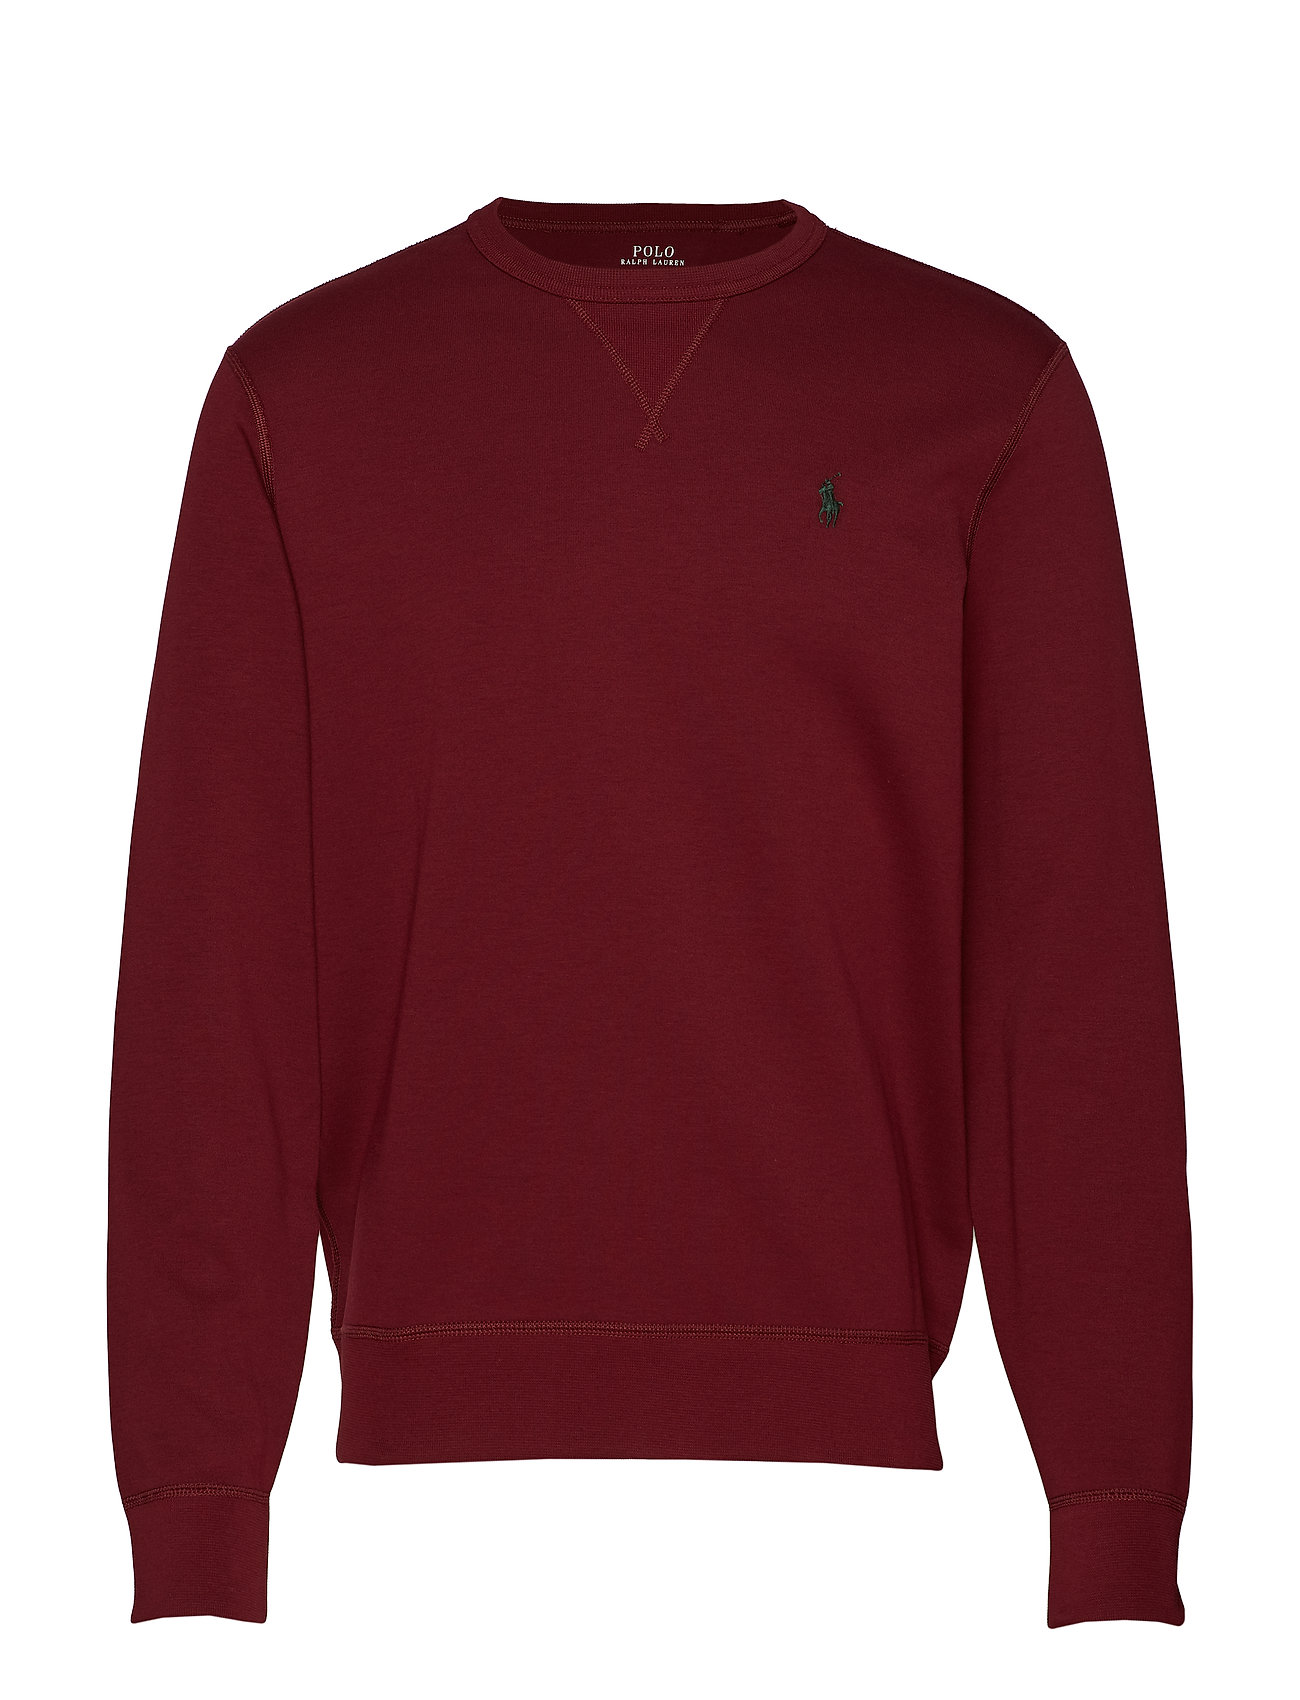 Polo Ralph Lauren Double-Knit Sweatshirt - CLASSIC WINE